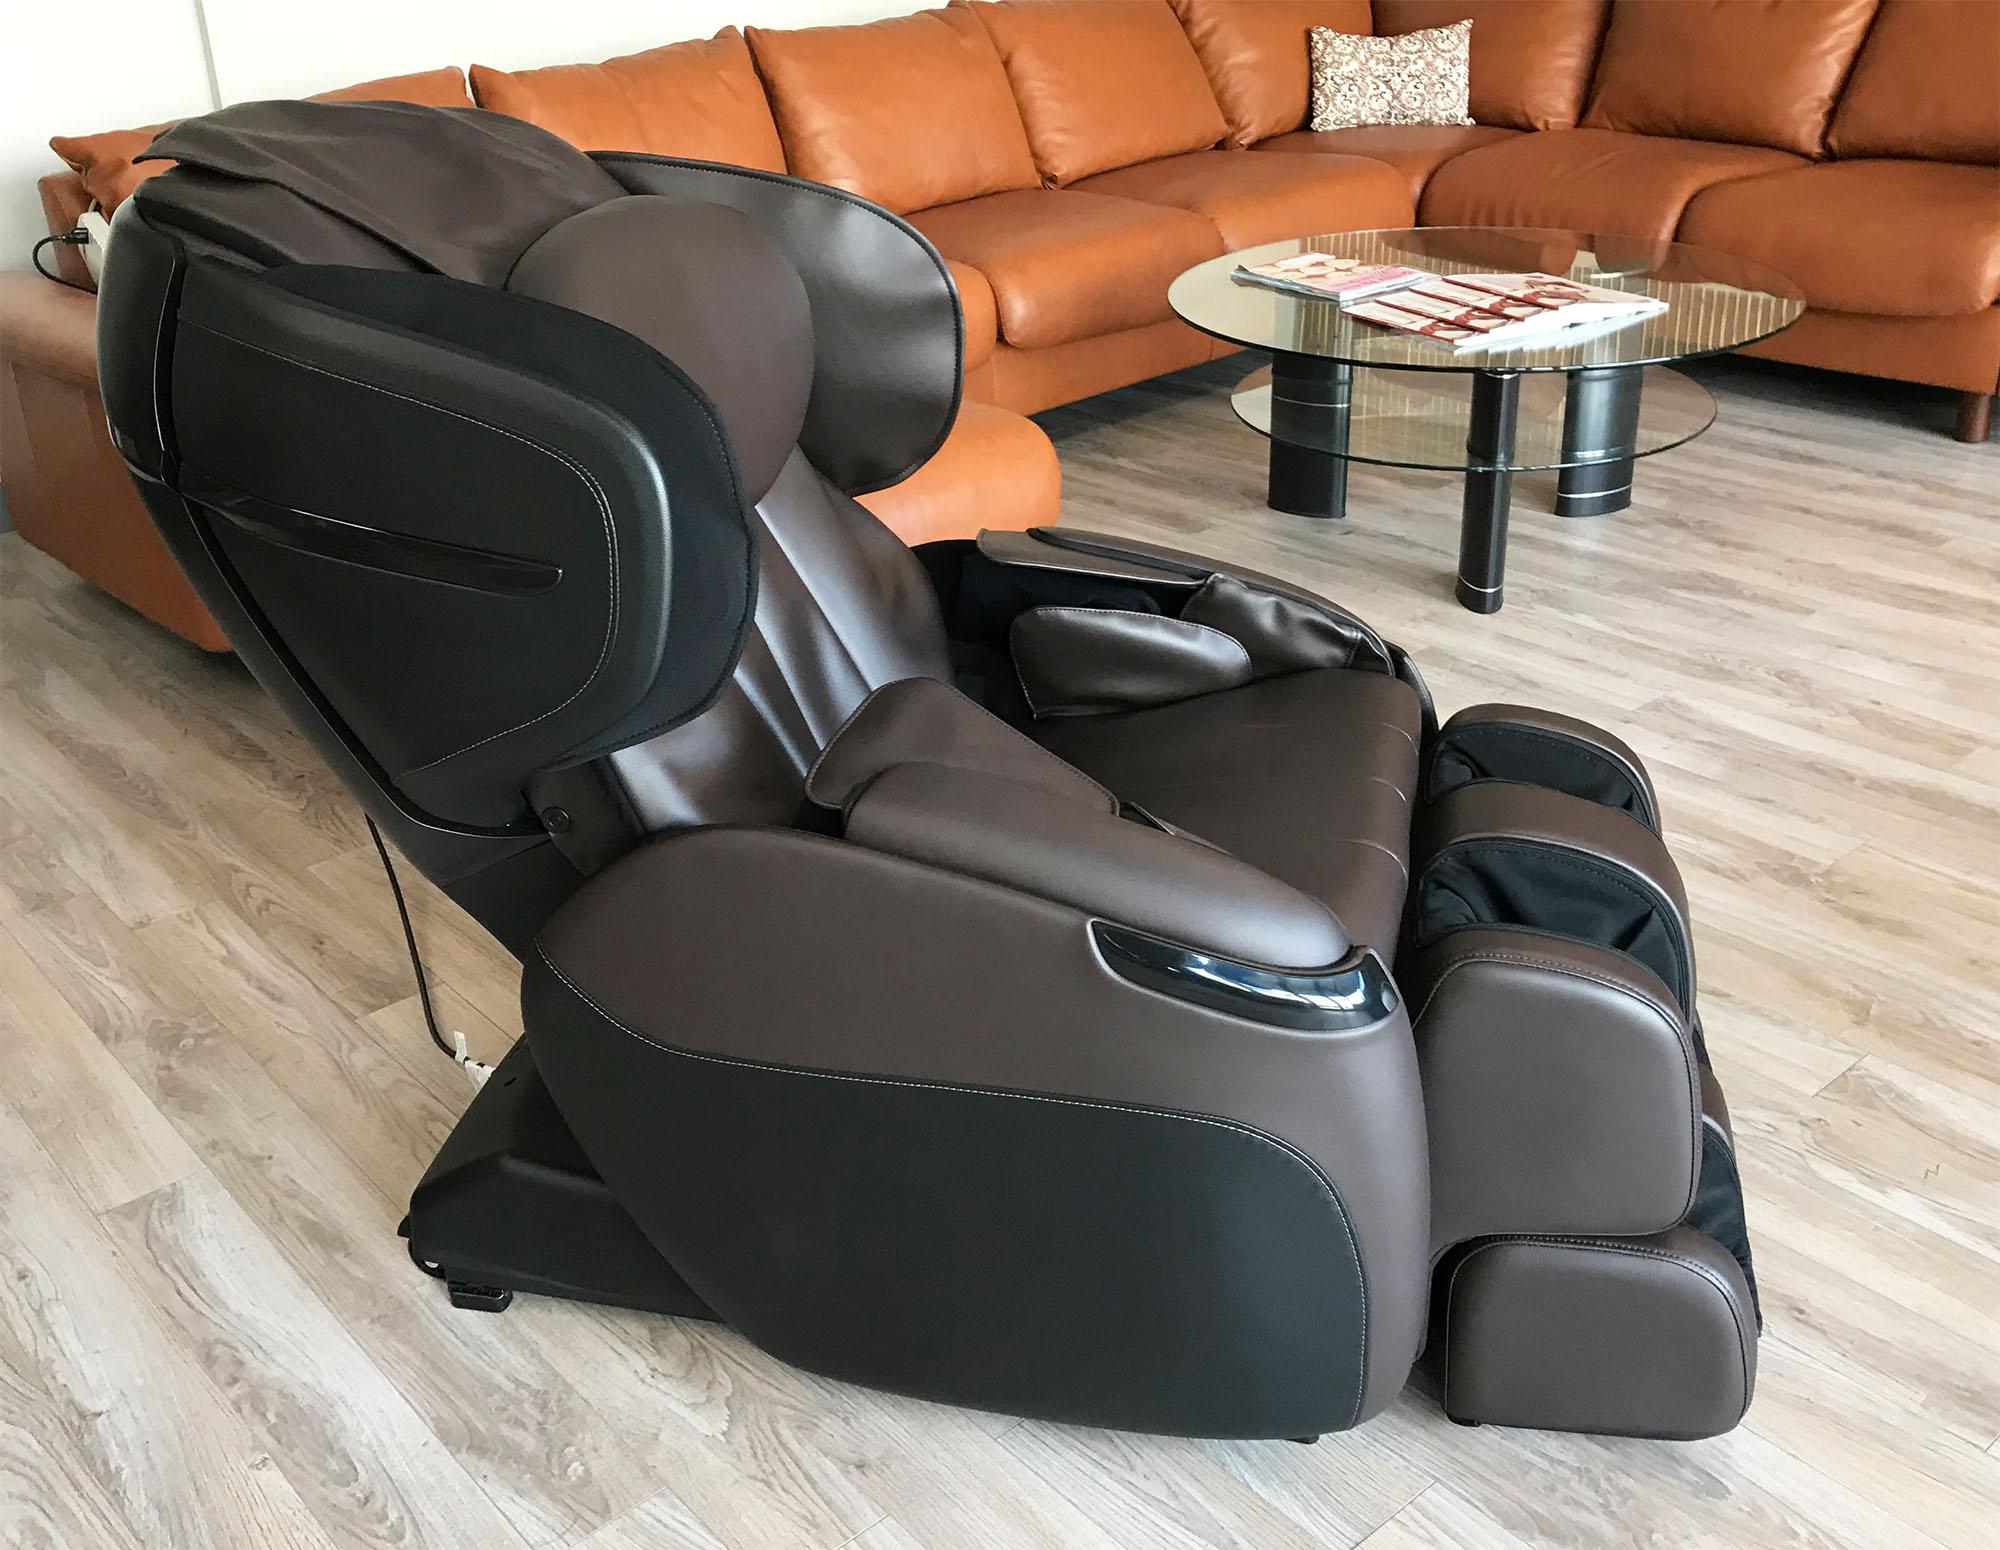 neutral posture chair parts rocker gaming uk espresso brown human touch opus 3d massage zero